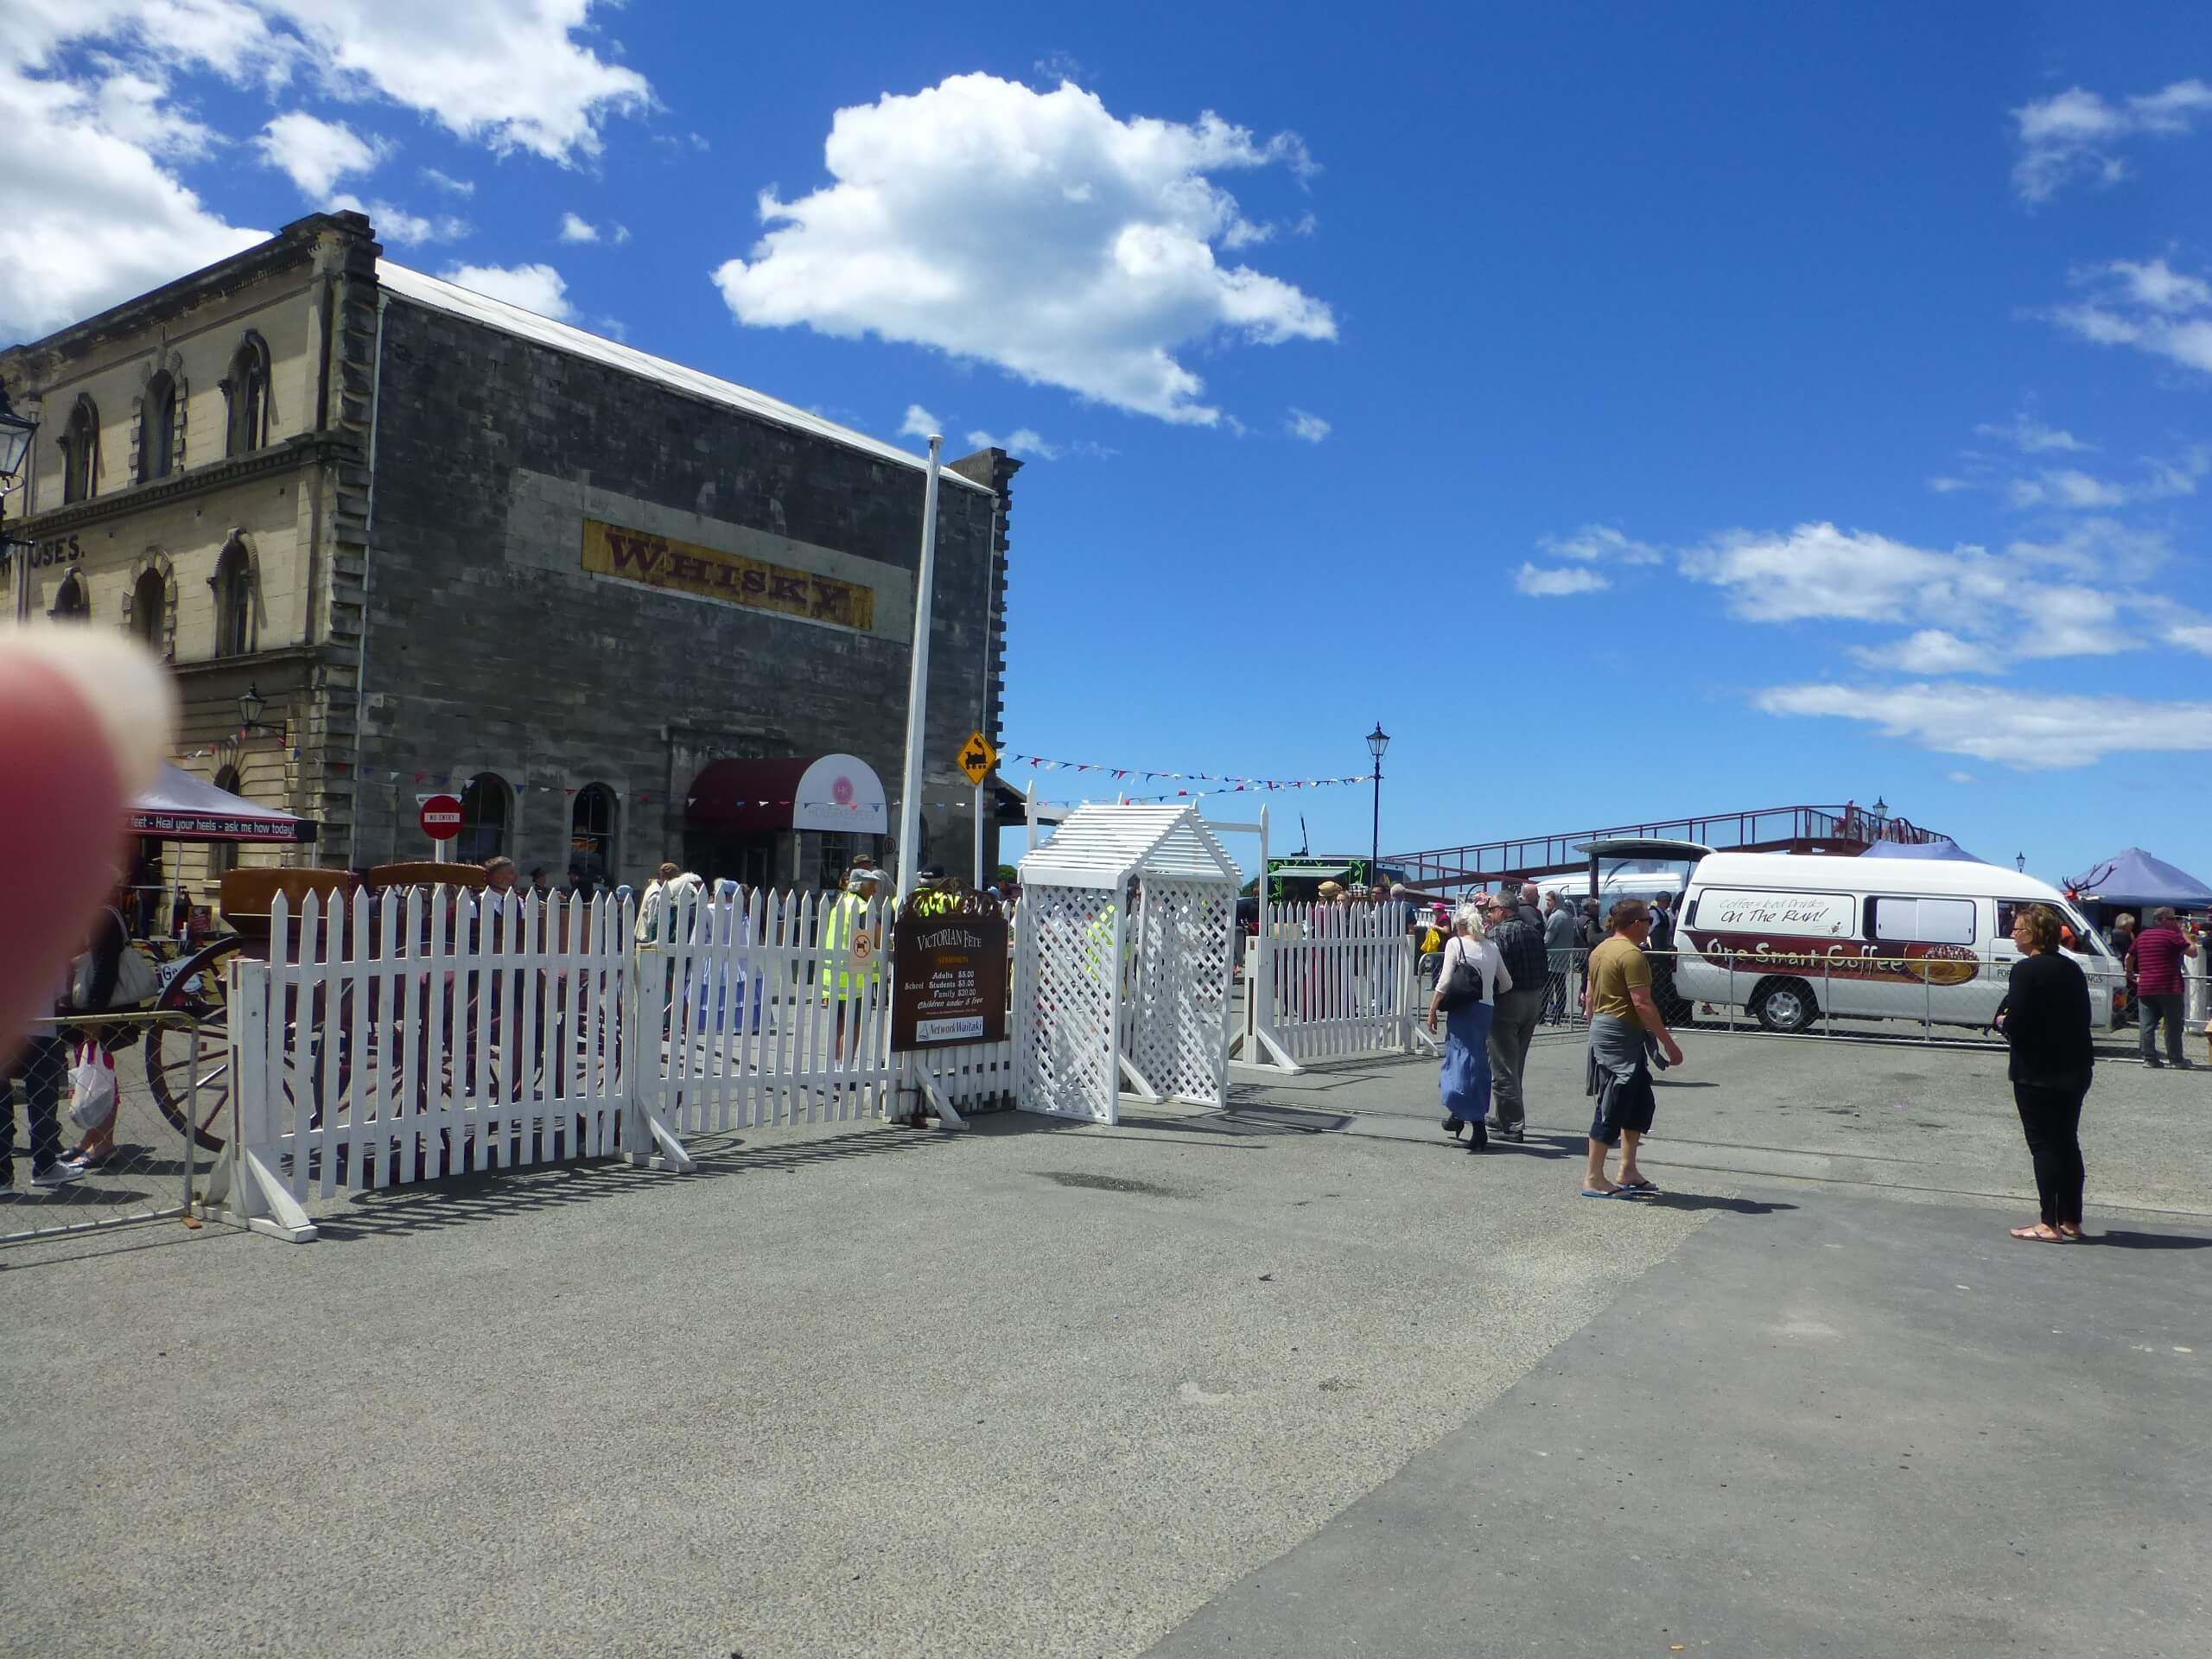 Eingang zum Viktorian Festival in Oamaru 1